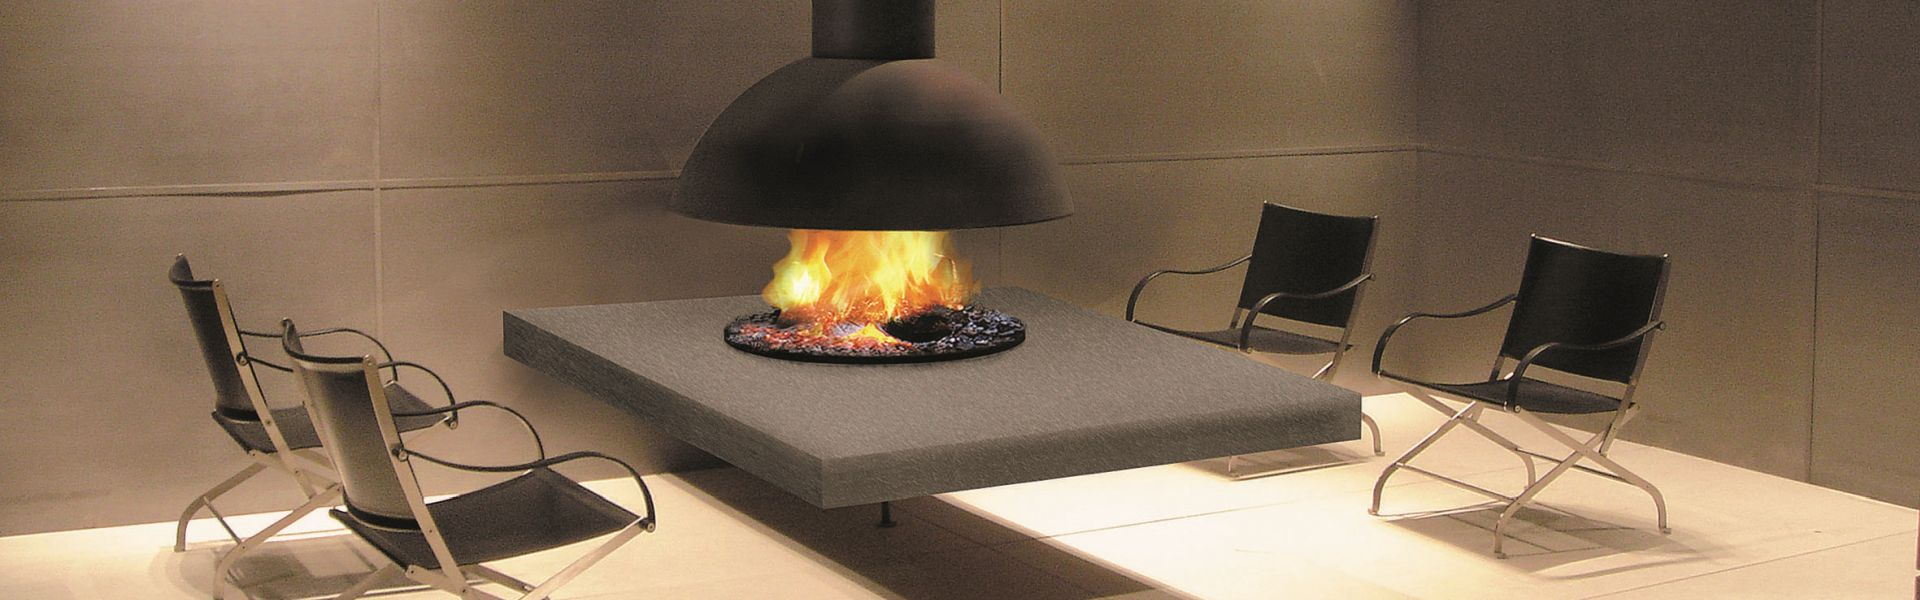 focus kamin best central designer fireplace ergofocus with focus kamin cheap jc bordelet. Black Bedroom Furniture Sets. Home Design Ideas